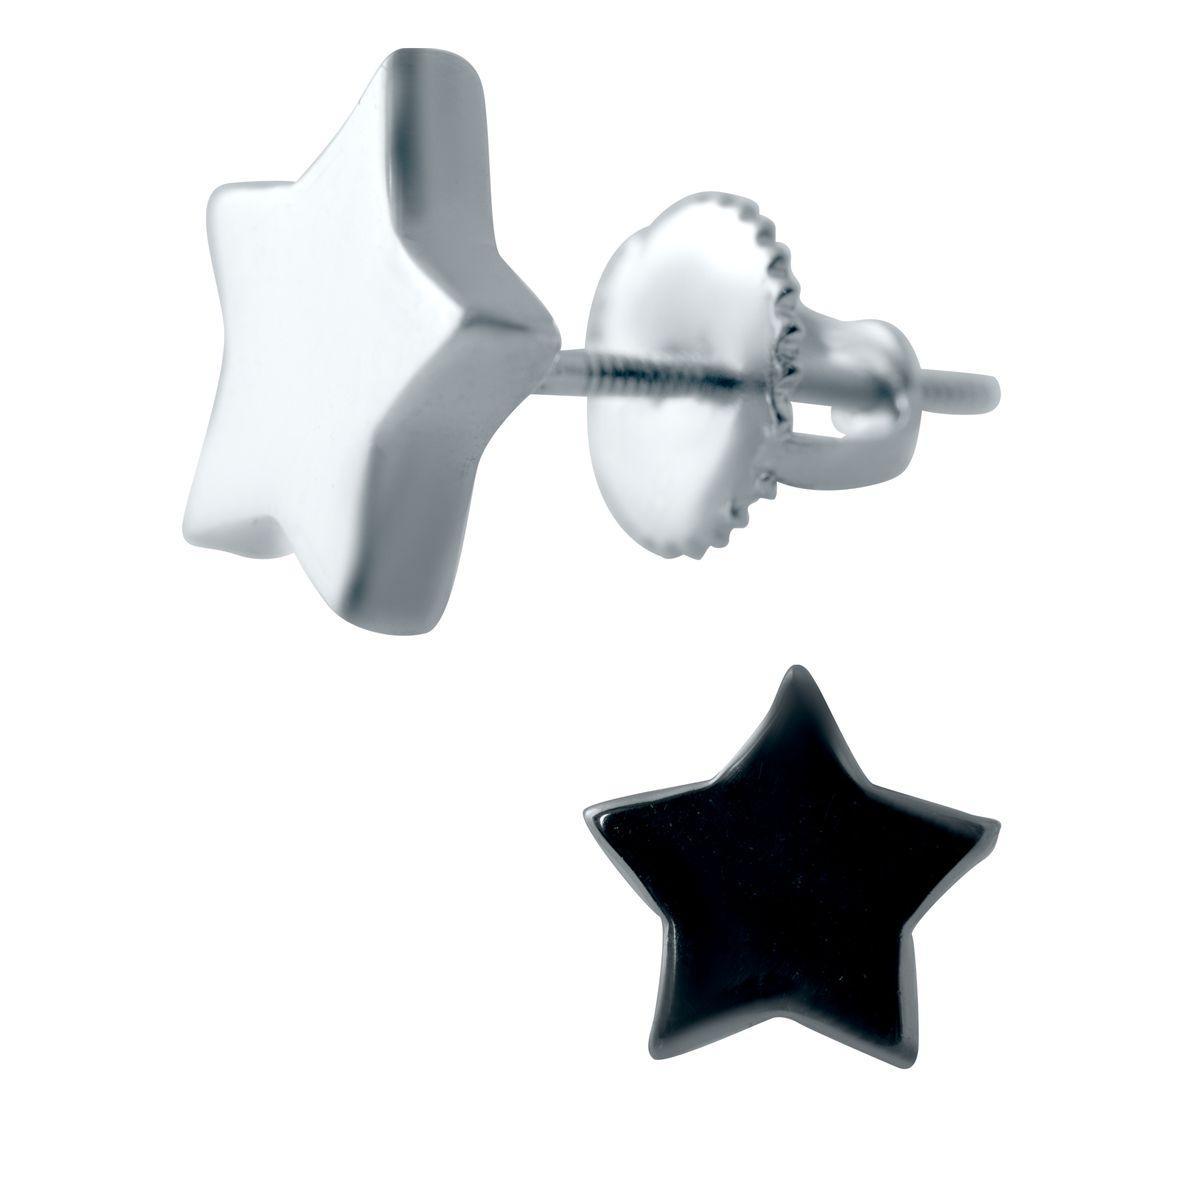 Серебряные серьги DreamJewelry без камней (2042013)